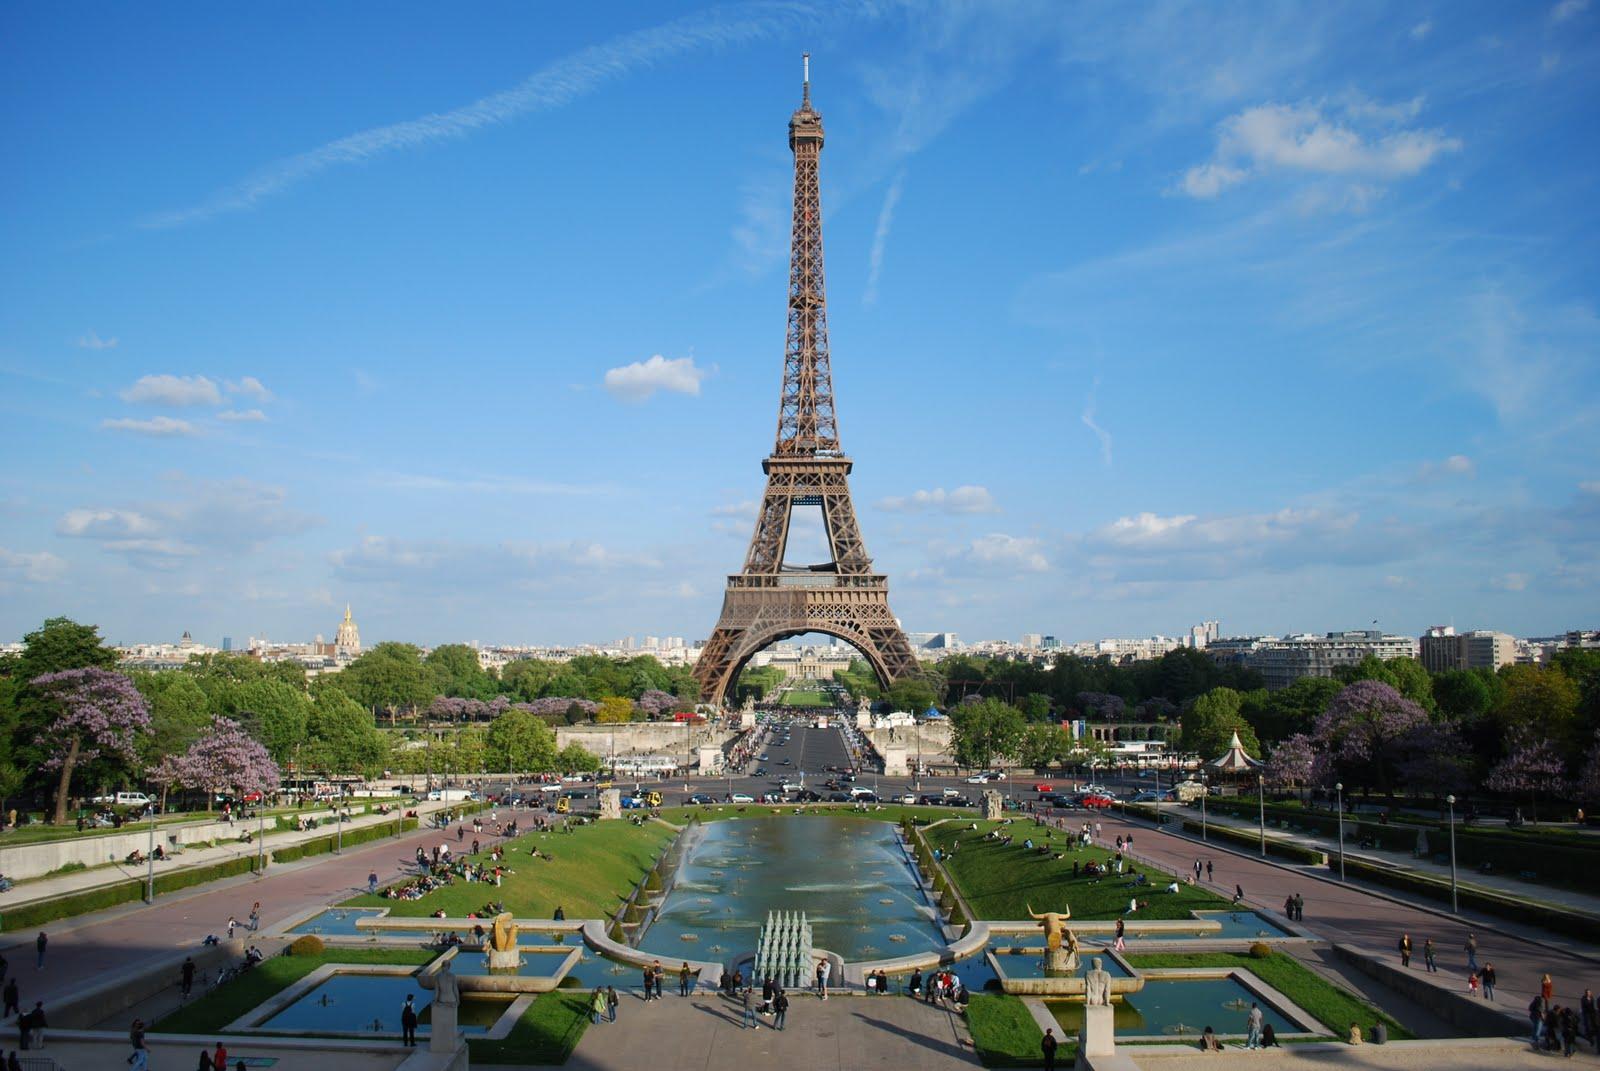 Natale 2014: con l'offerta di Groupon, regala un week-end a sorpresa in una delle più belle capitali europee.